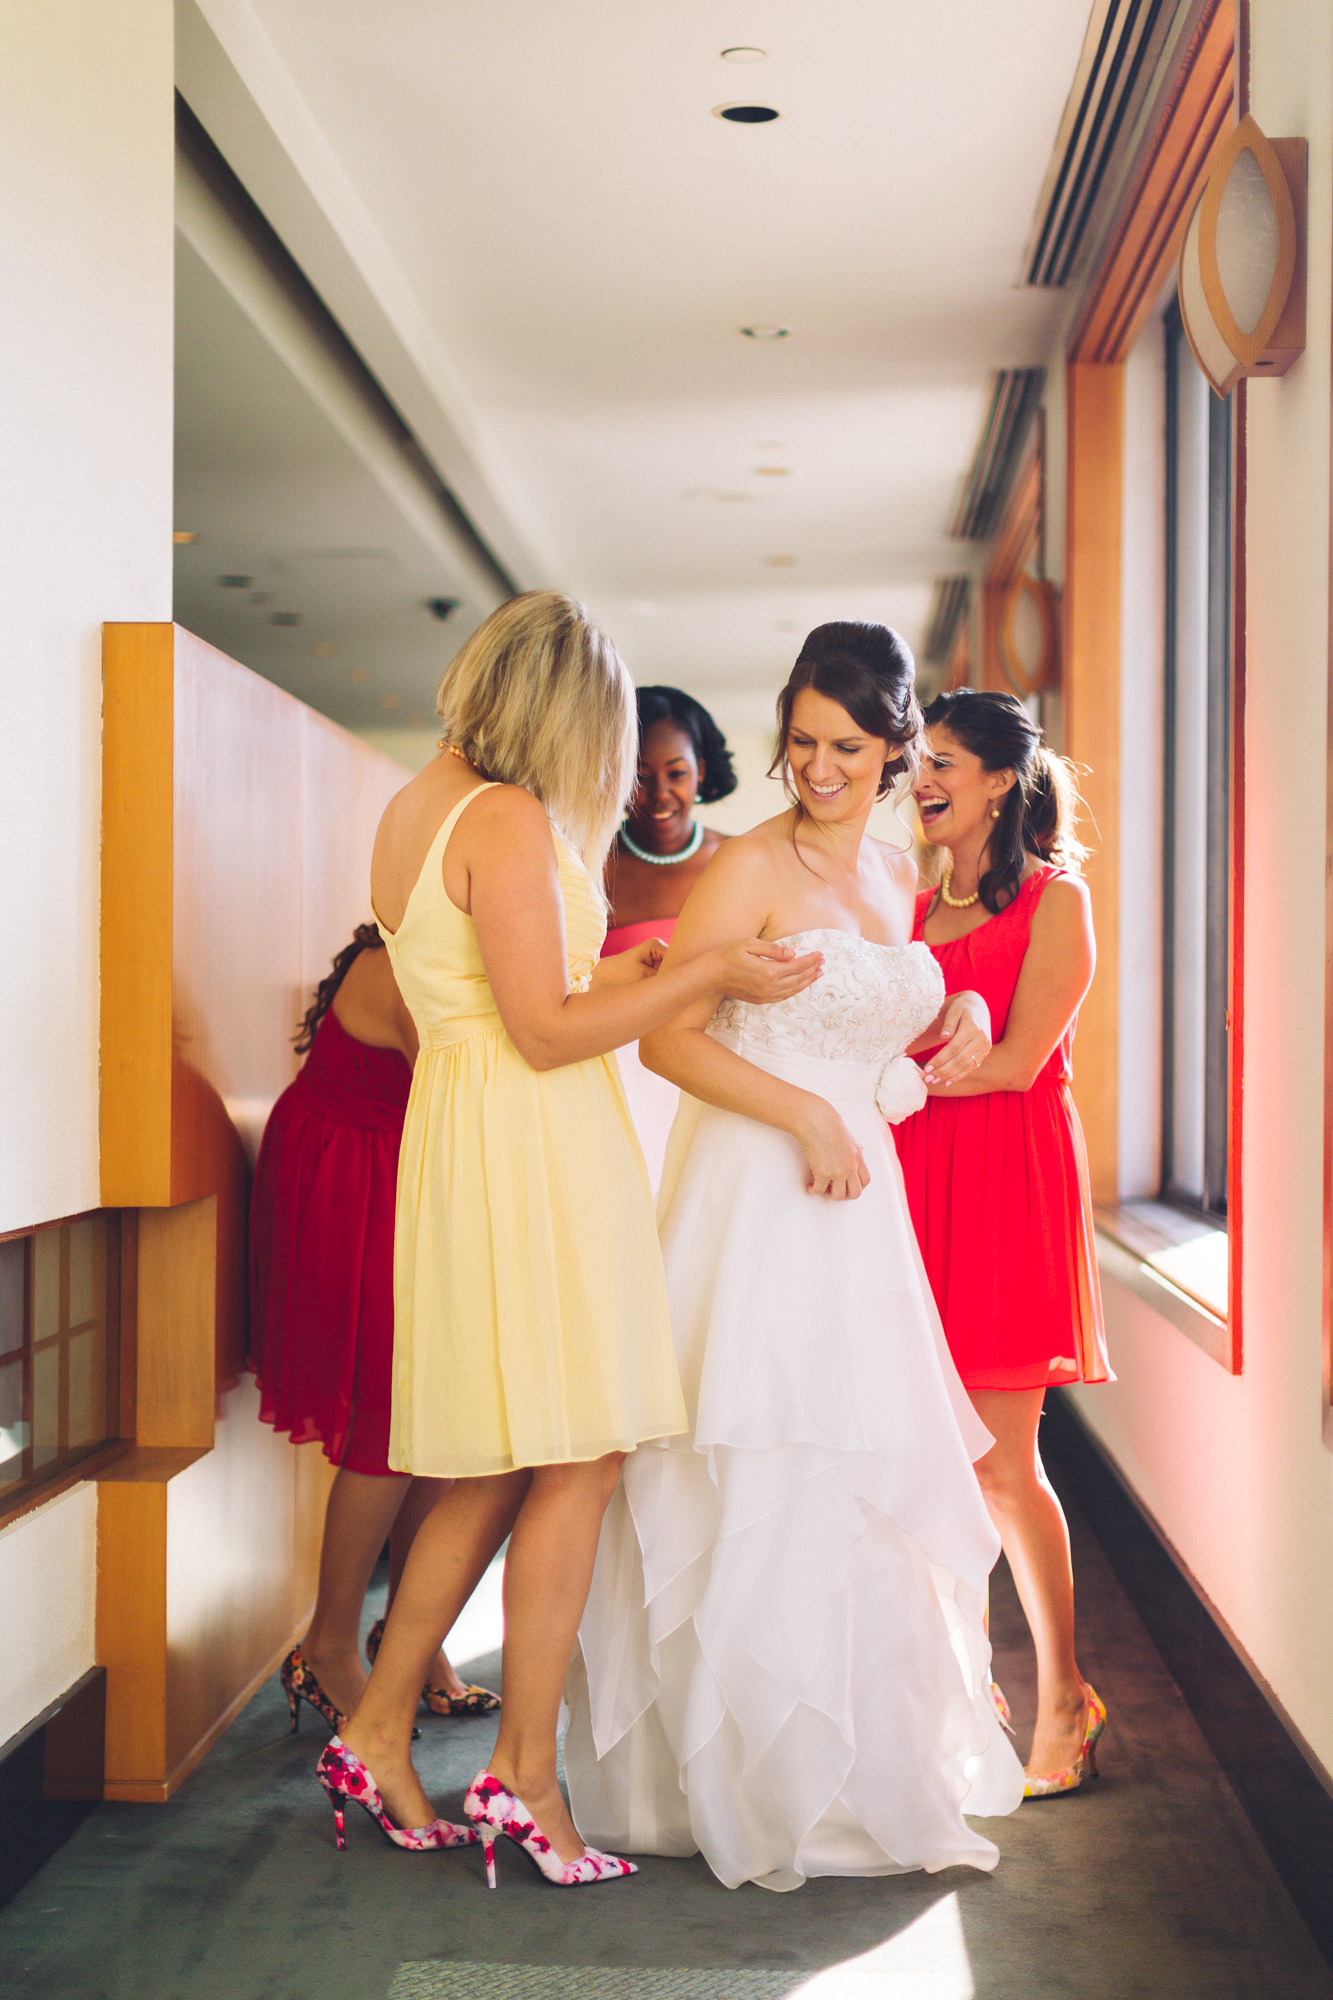 thelightandglass-wedding-engagement-photography-019.jpg